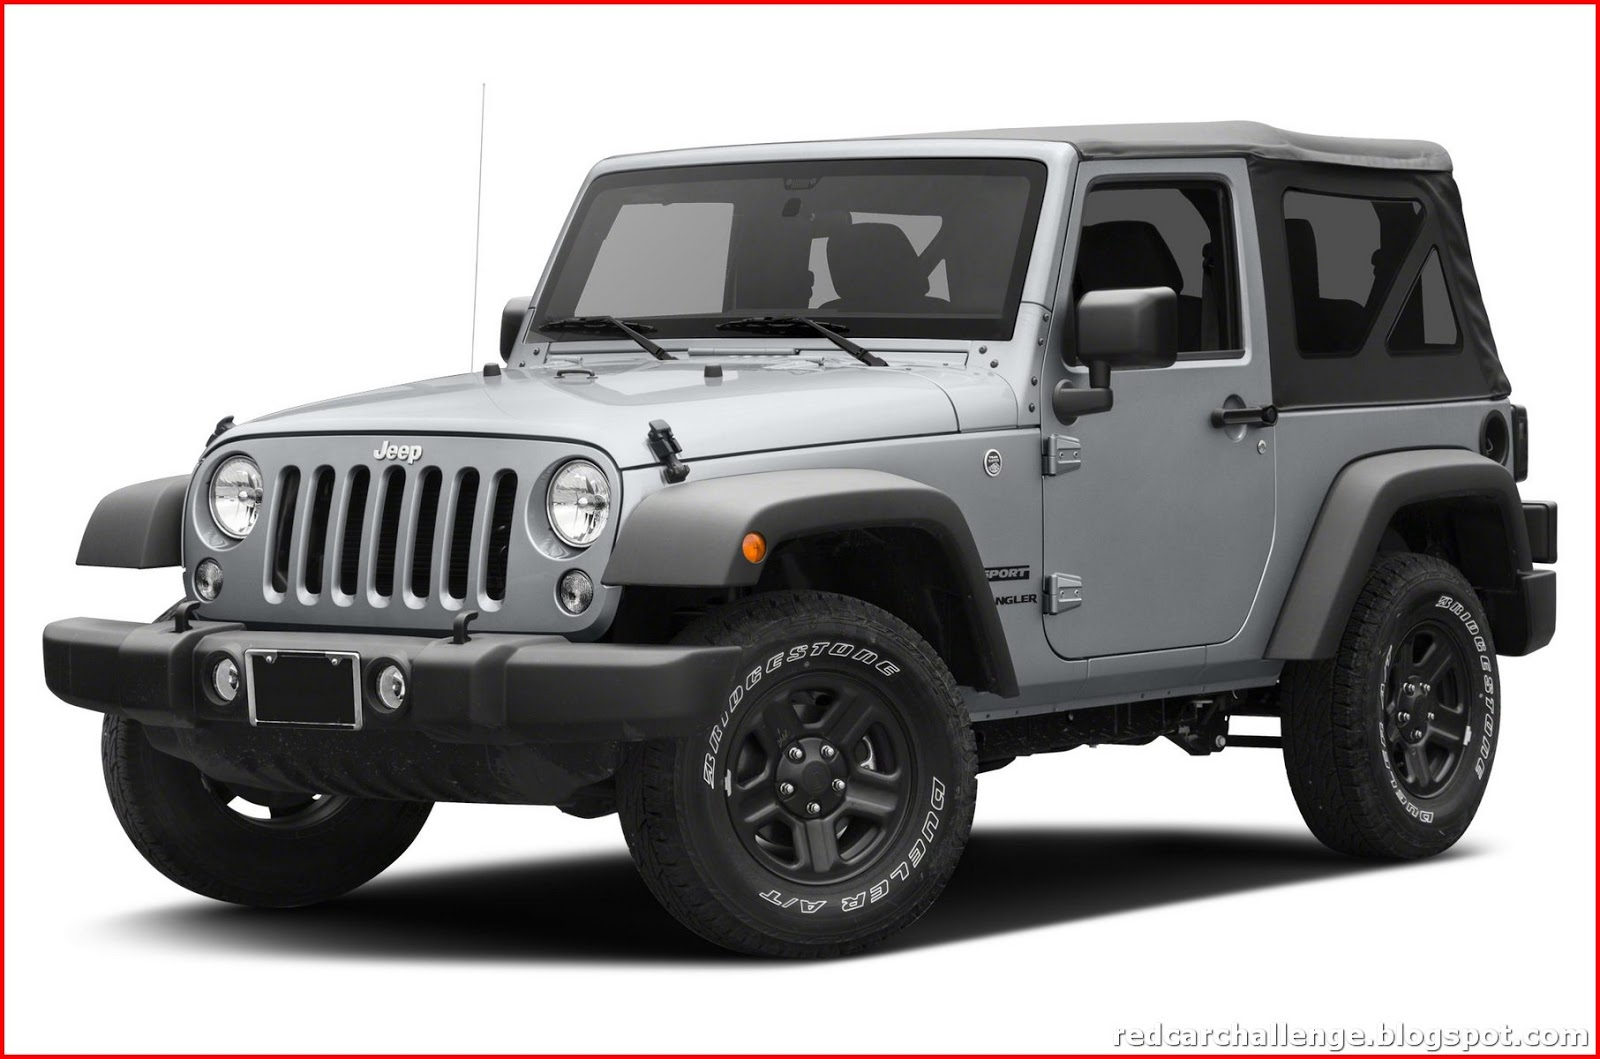 Jeep Wrangler MSRP